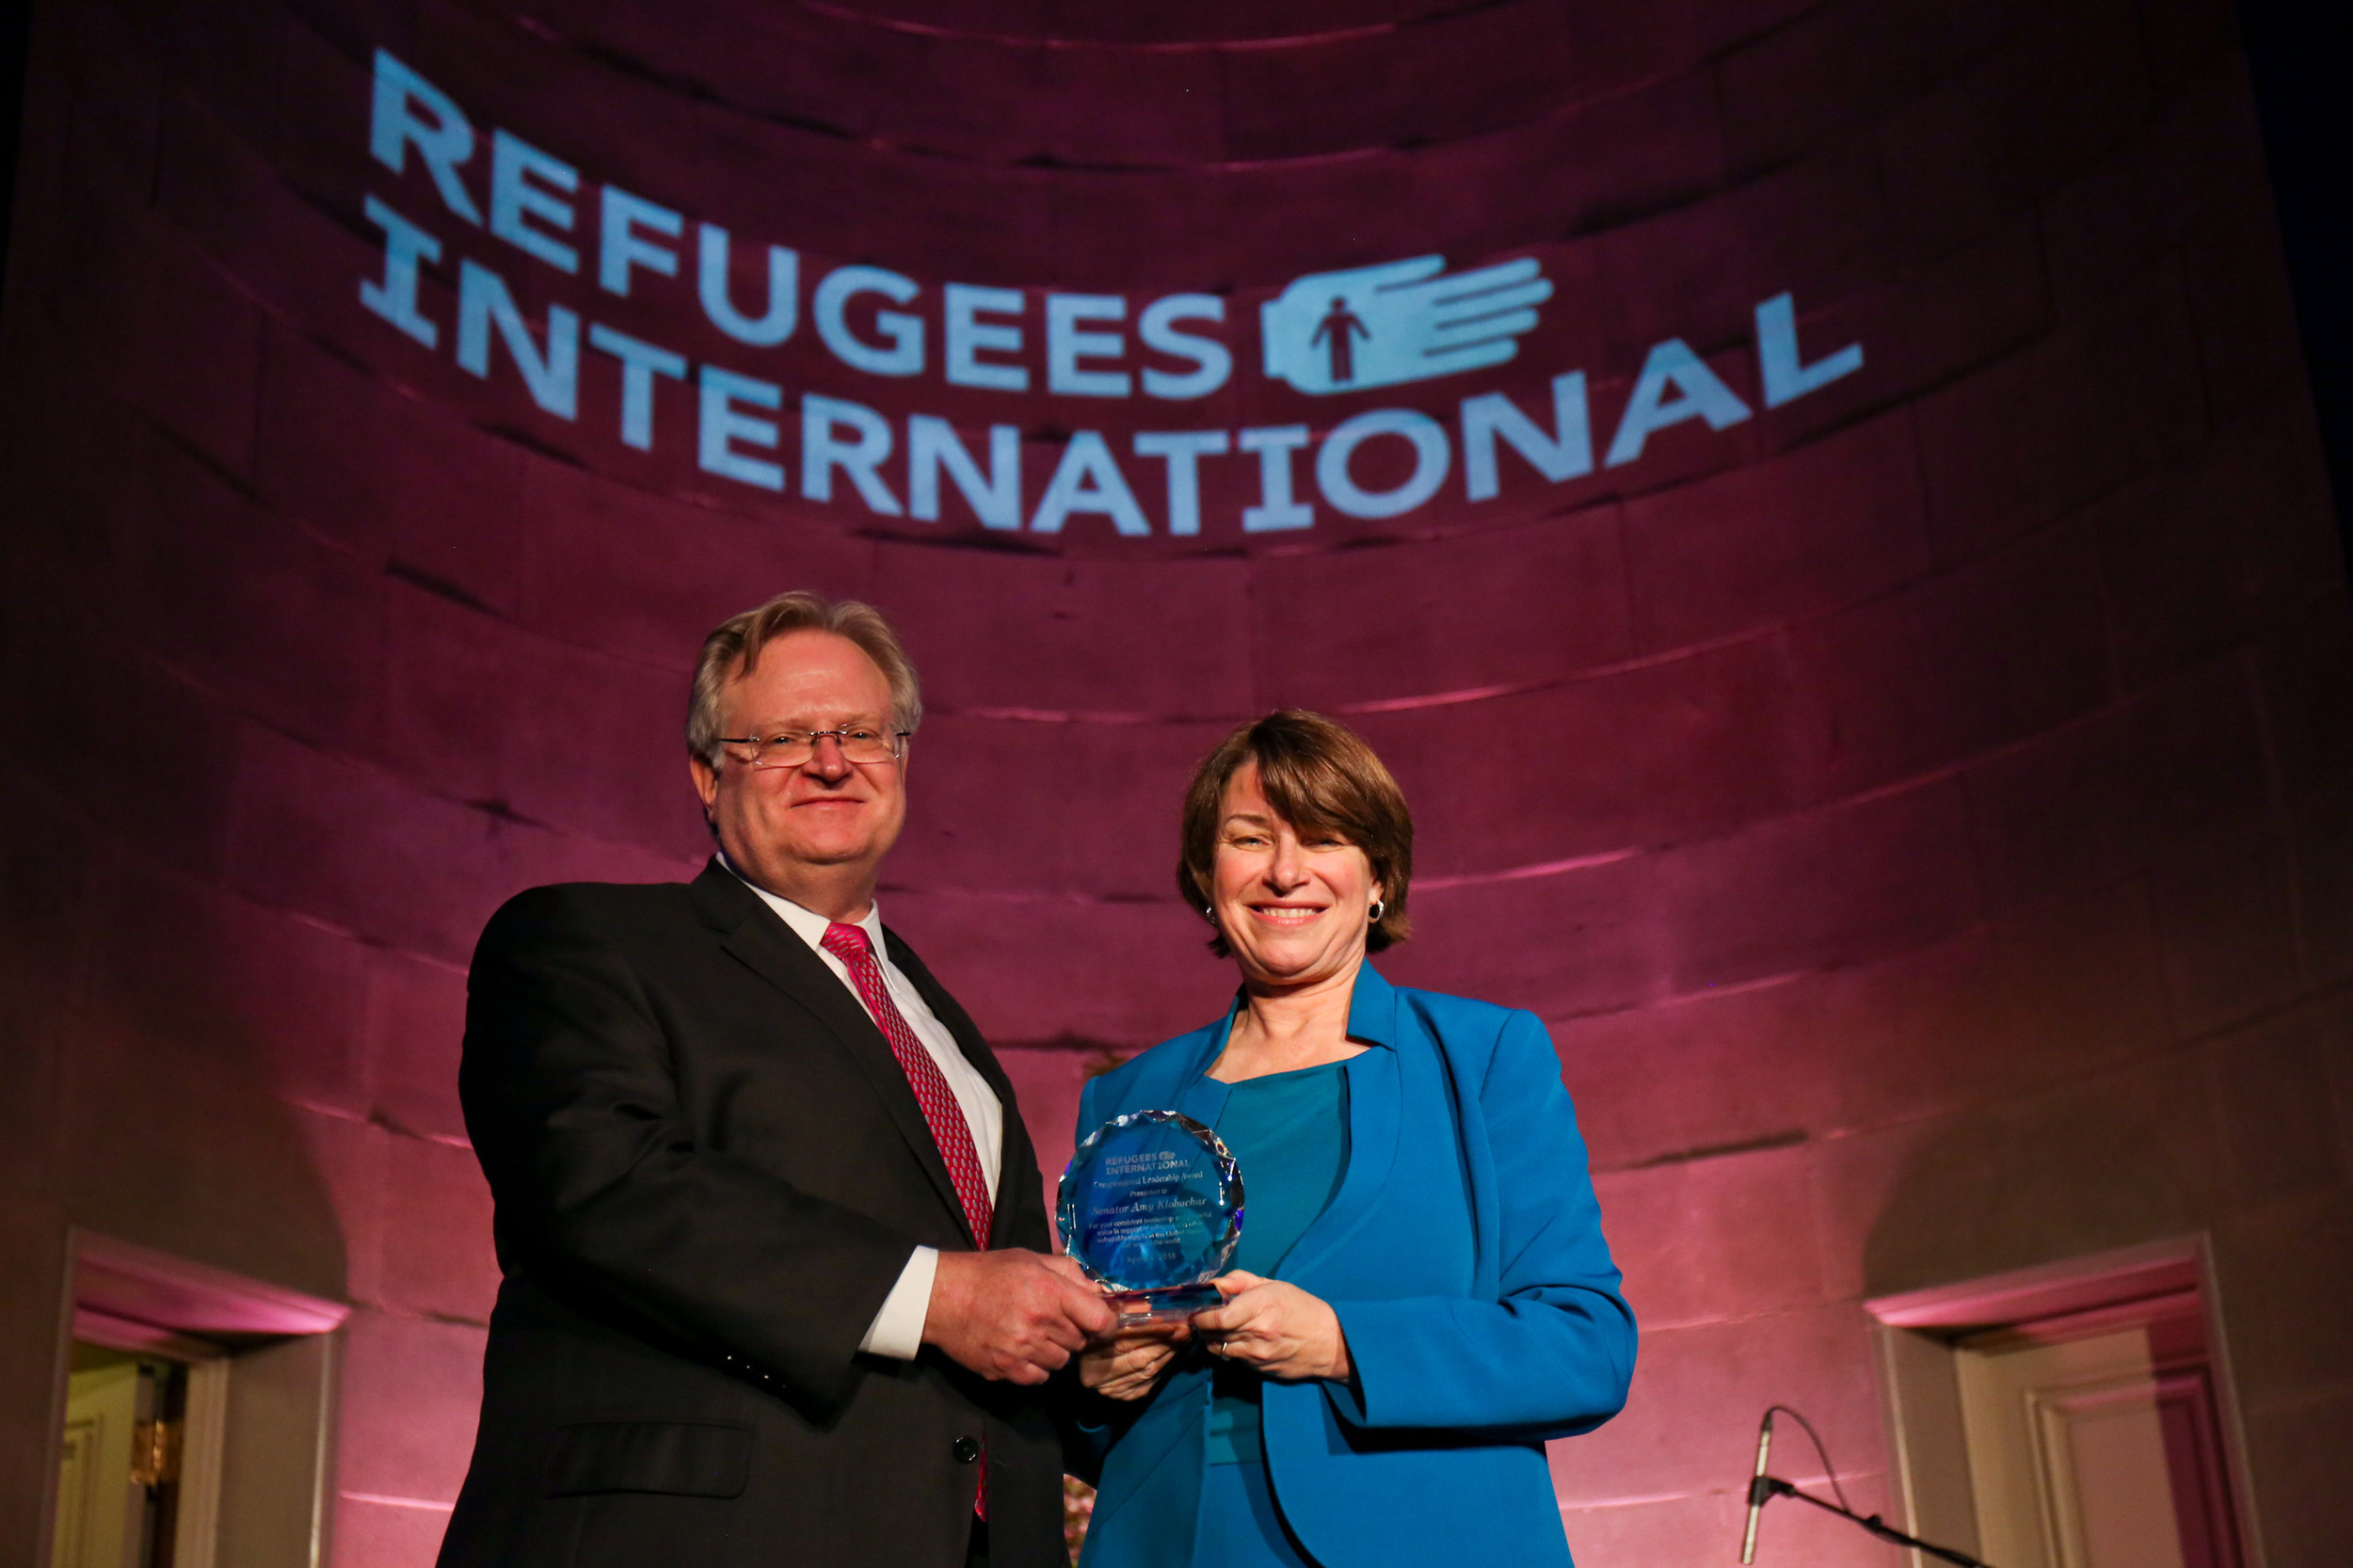 Refugees International President Eric Schwartz presents the 2018 Congressional Leadership Award to Senator Amy Klobuchar of Minnesota